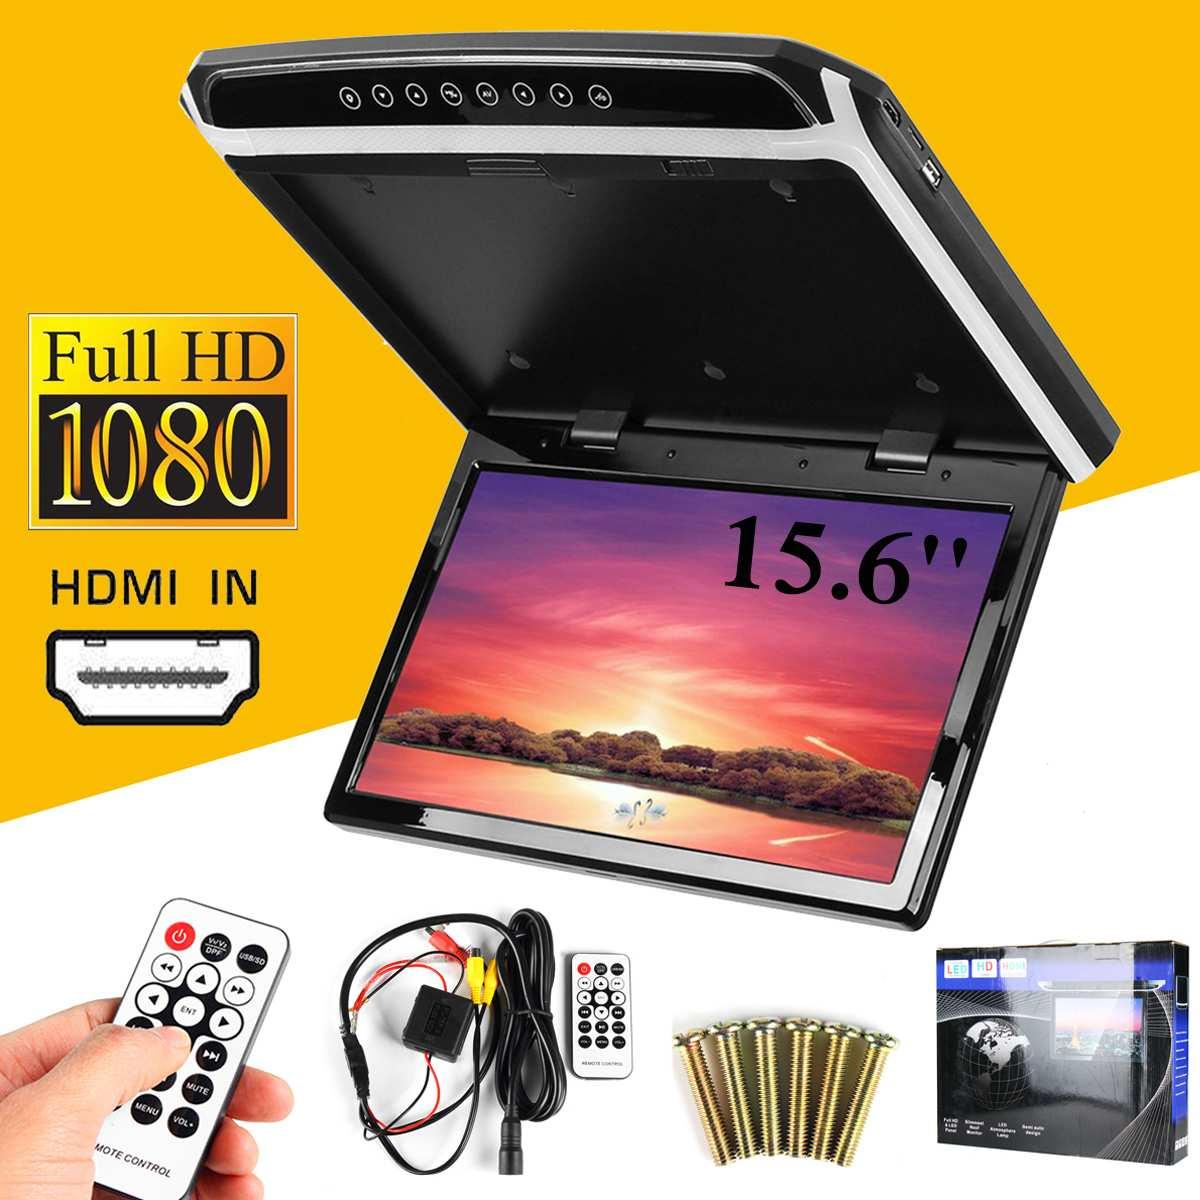 15.6 hd tela larga carro dvd player hdmi teto do carro flip down monitor telhado montagem jogador 1920*1080 - 3